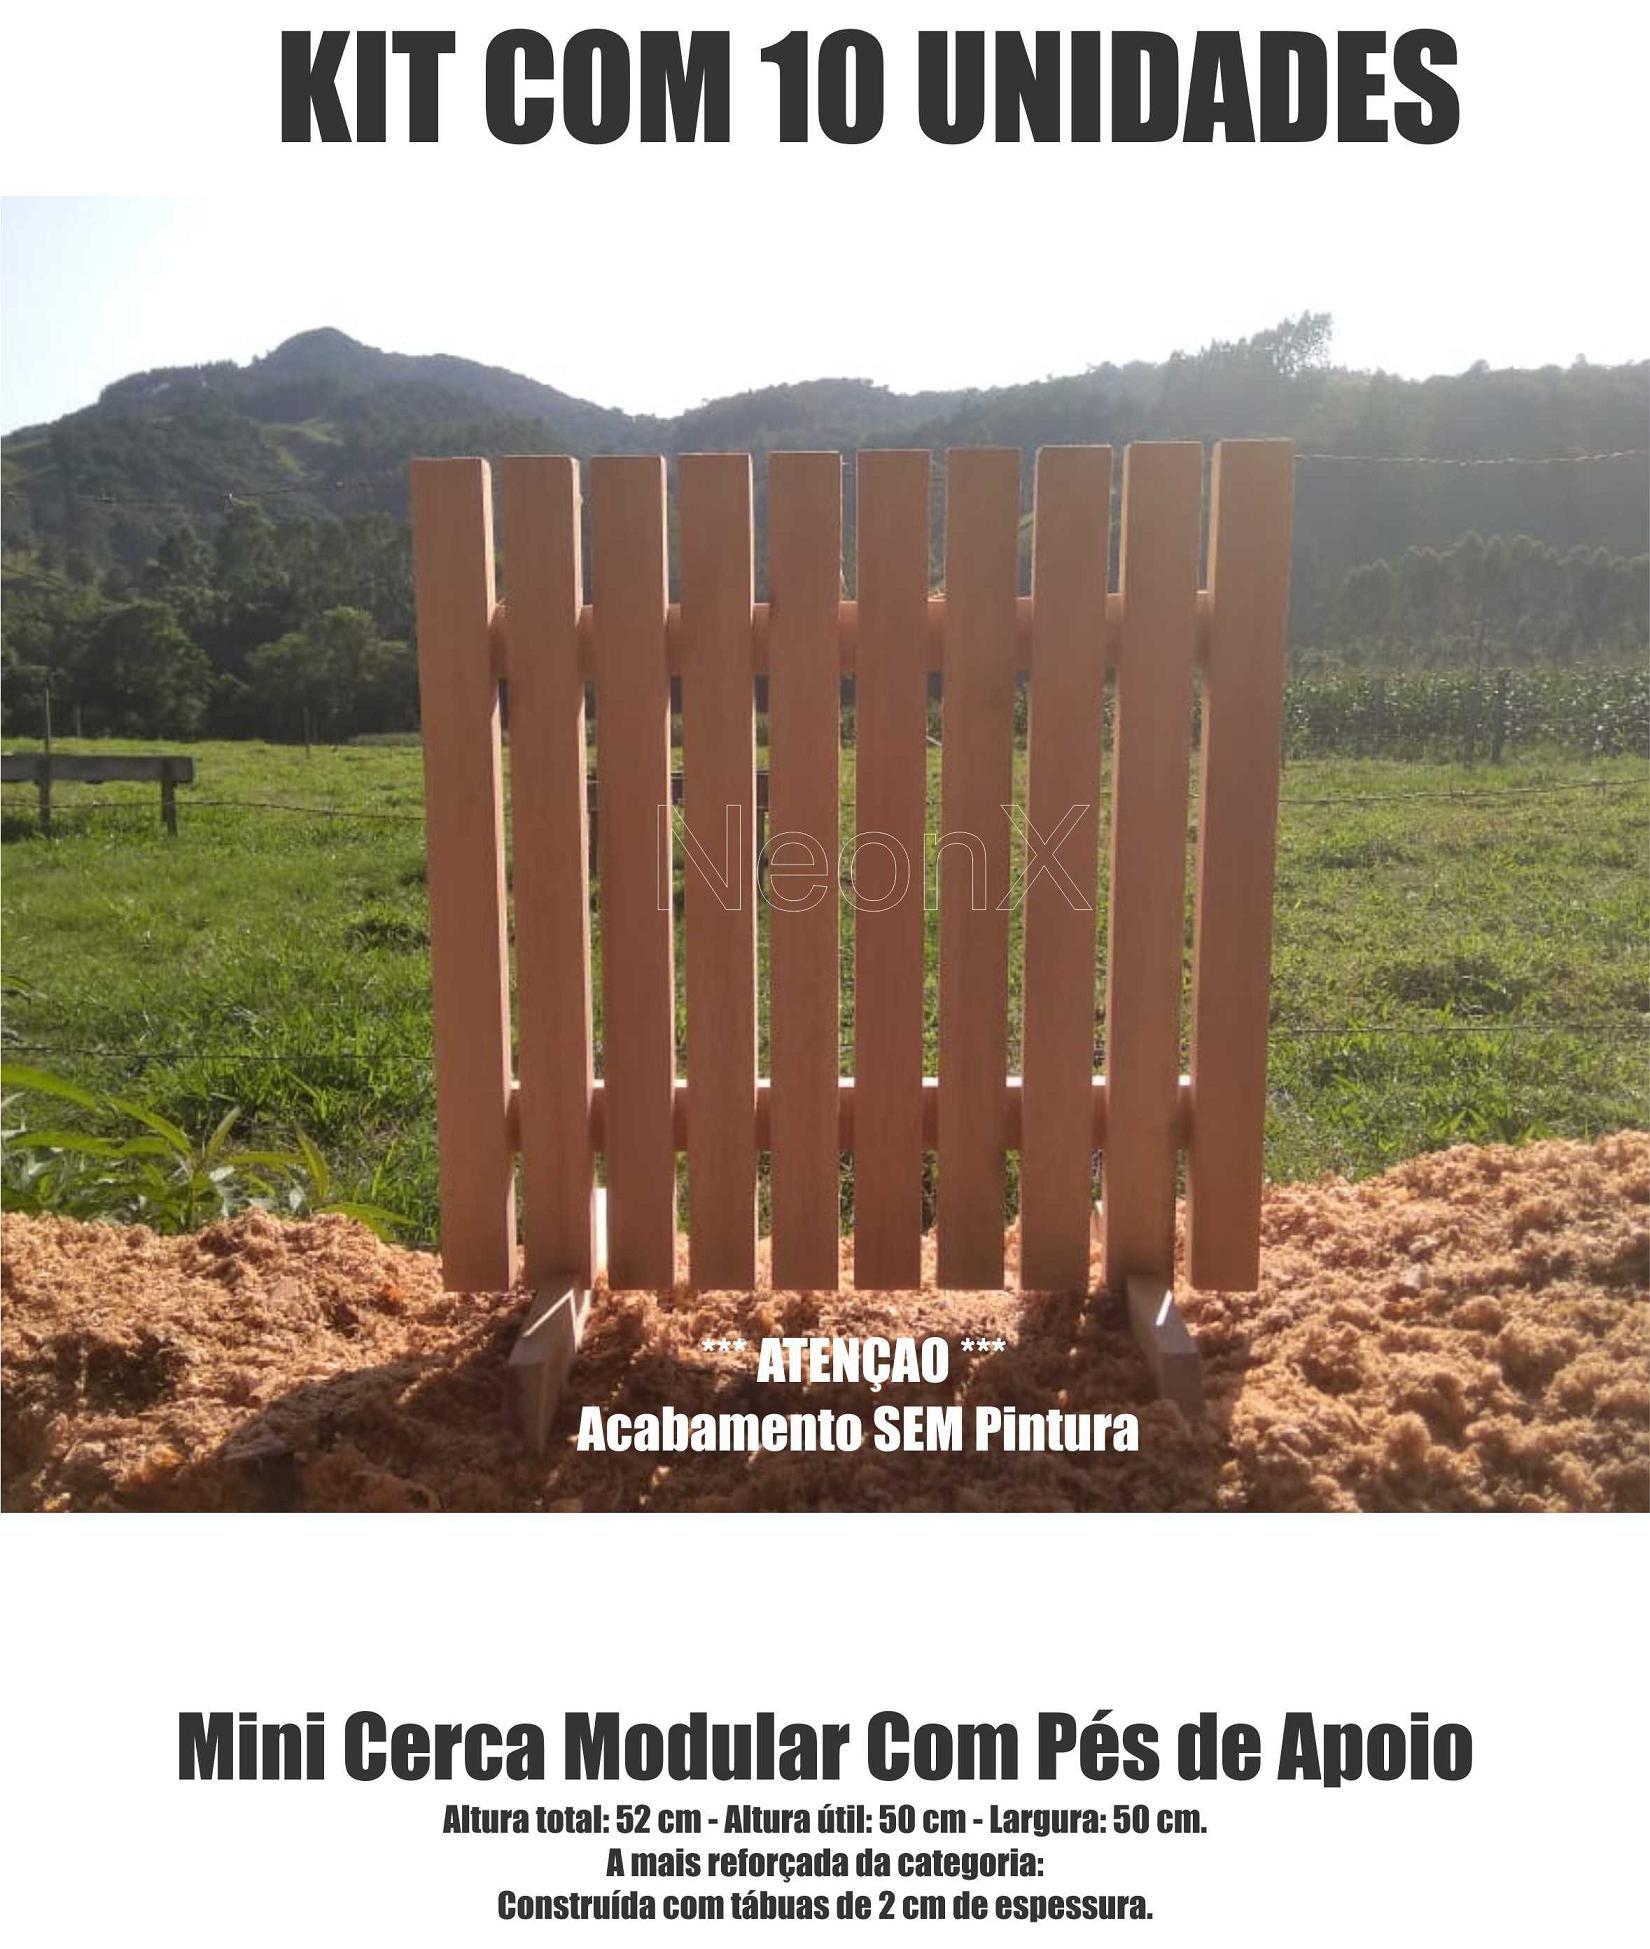 Kit 10 Un Cerca para Jardim Horta Decoração, Interna ou Externa com Pés 50x50 cm Sem Pintura NeonX